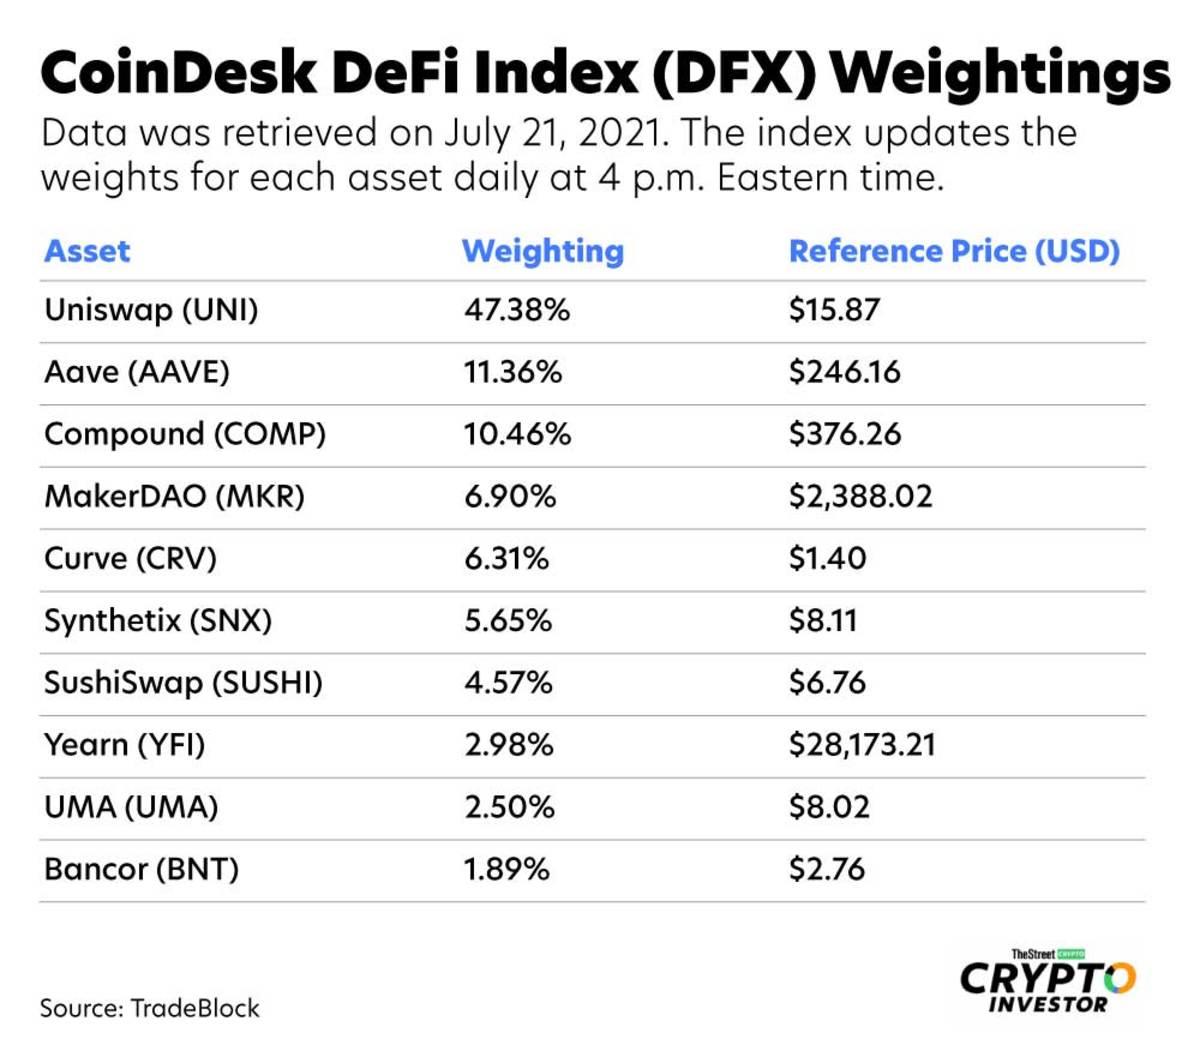 dfx-weightings-july-21